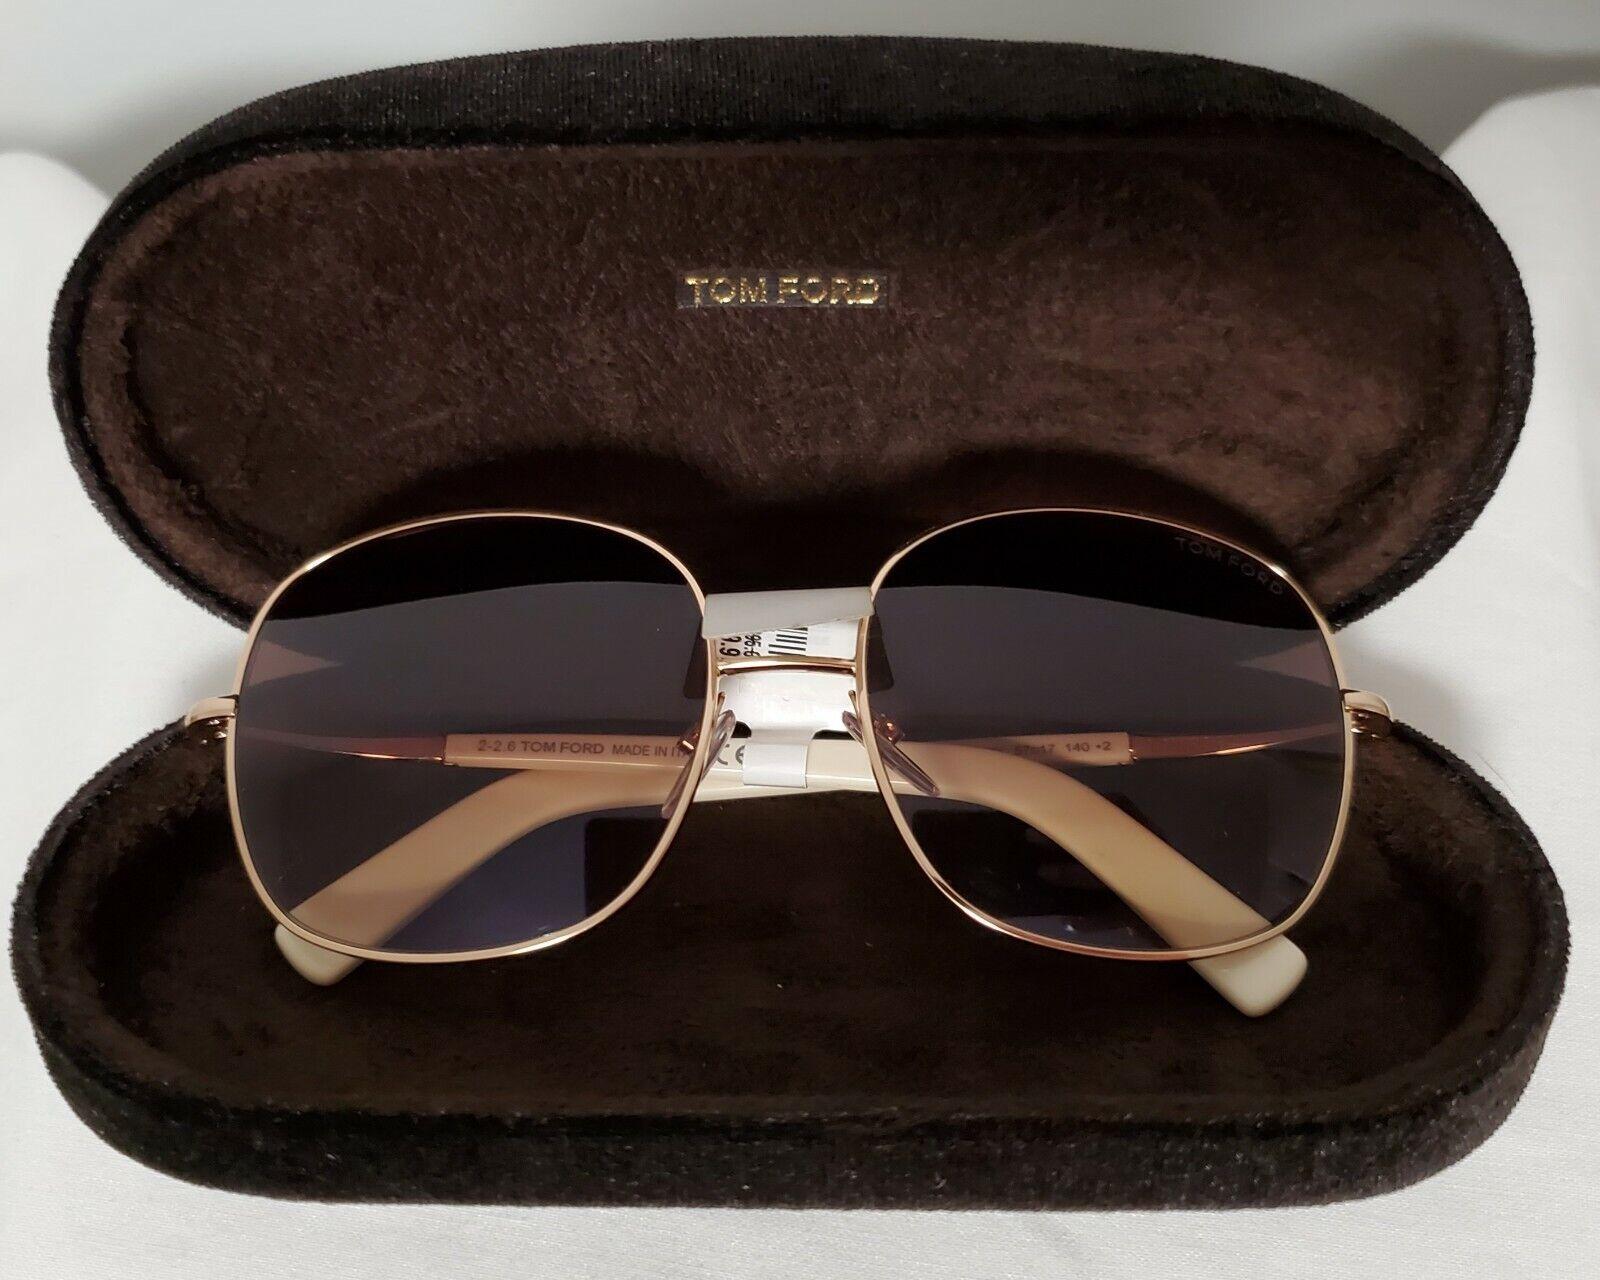 NWT+CASE!NORDSTROM TOM FORD GEORGINA TF499 28K Brown Ivory Sunglasses 57 17 140